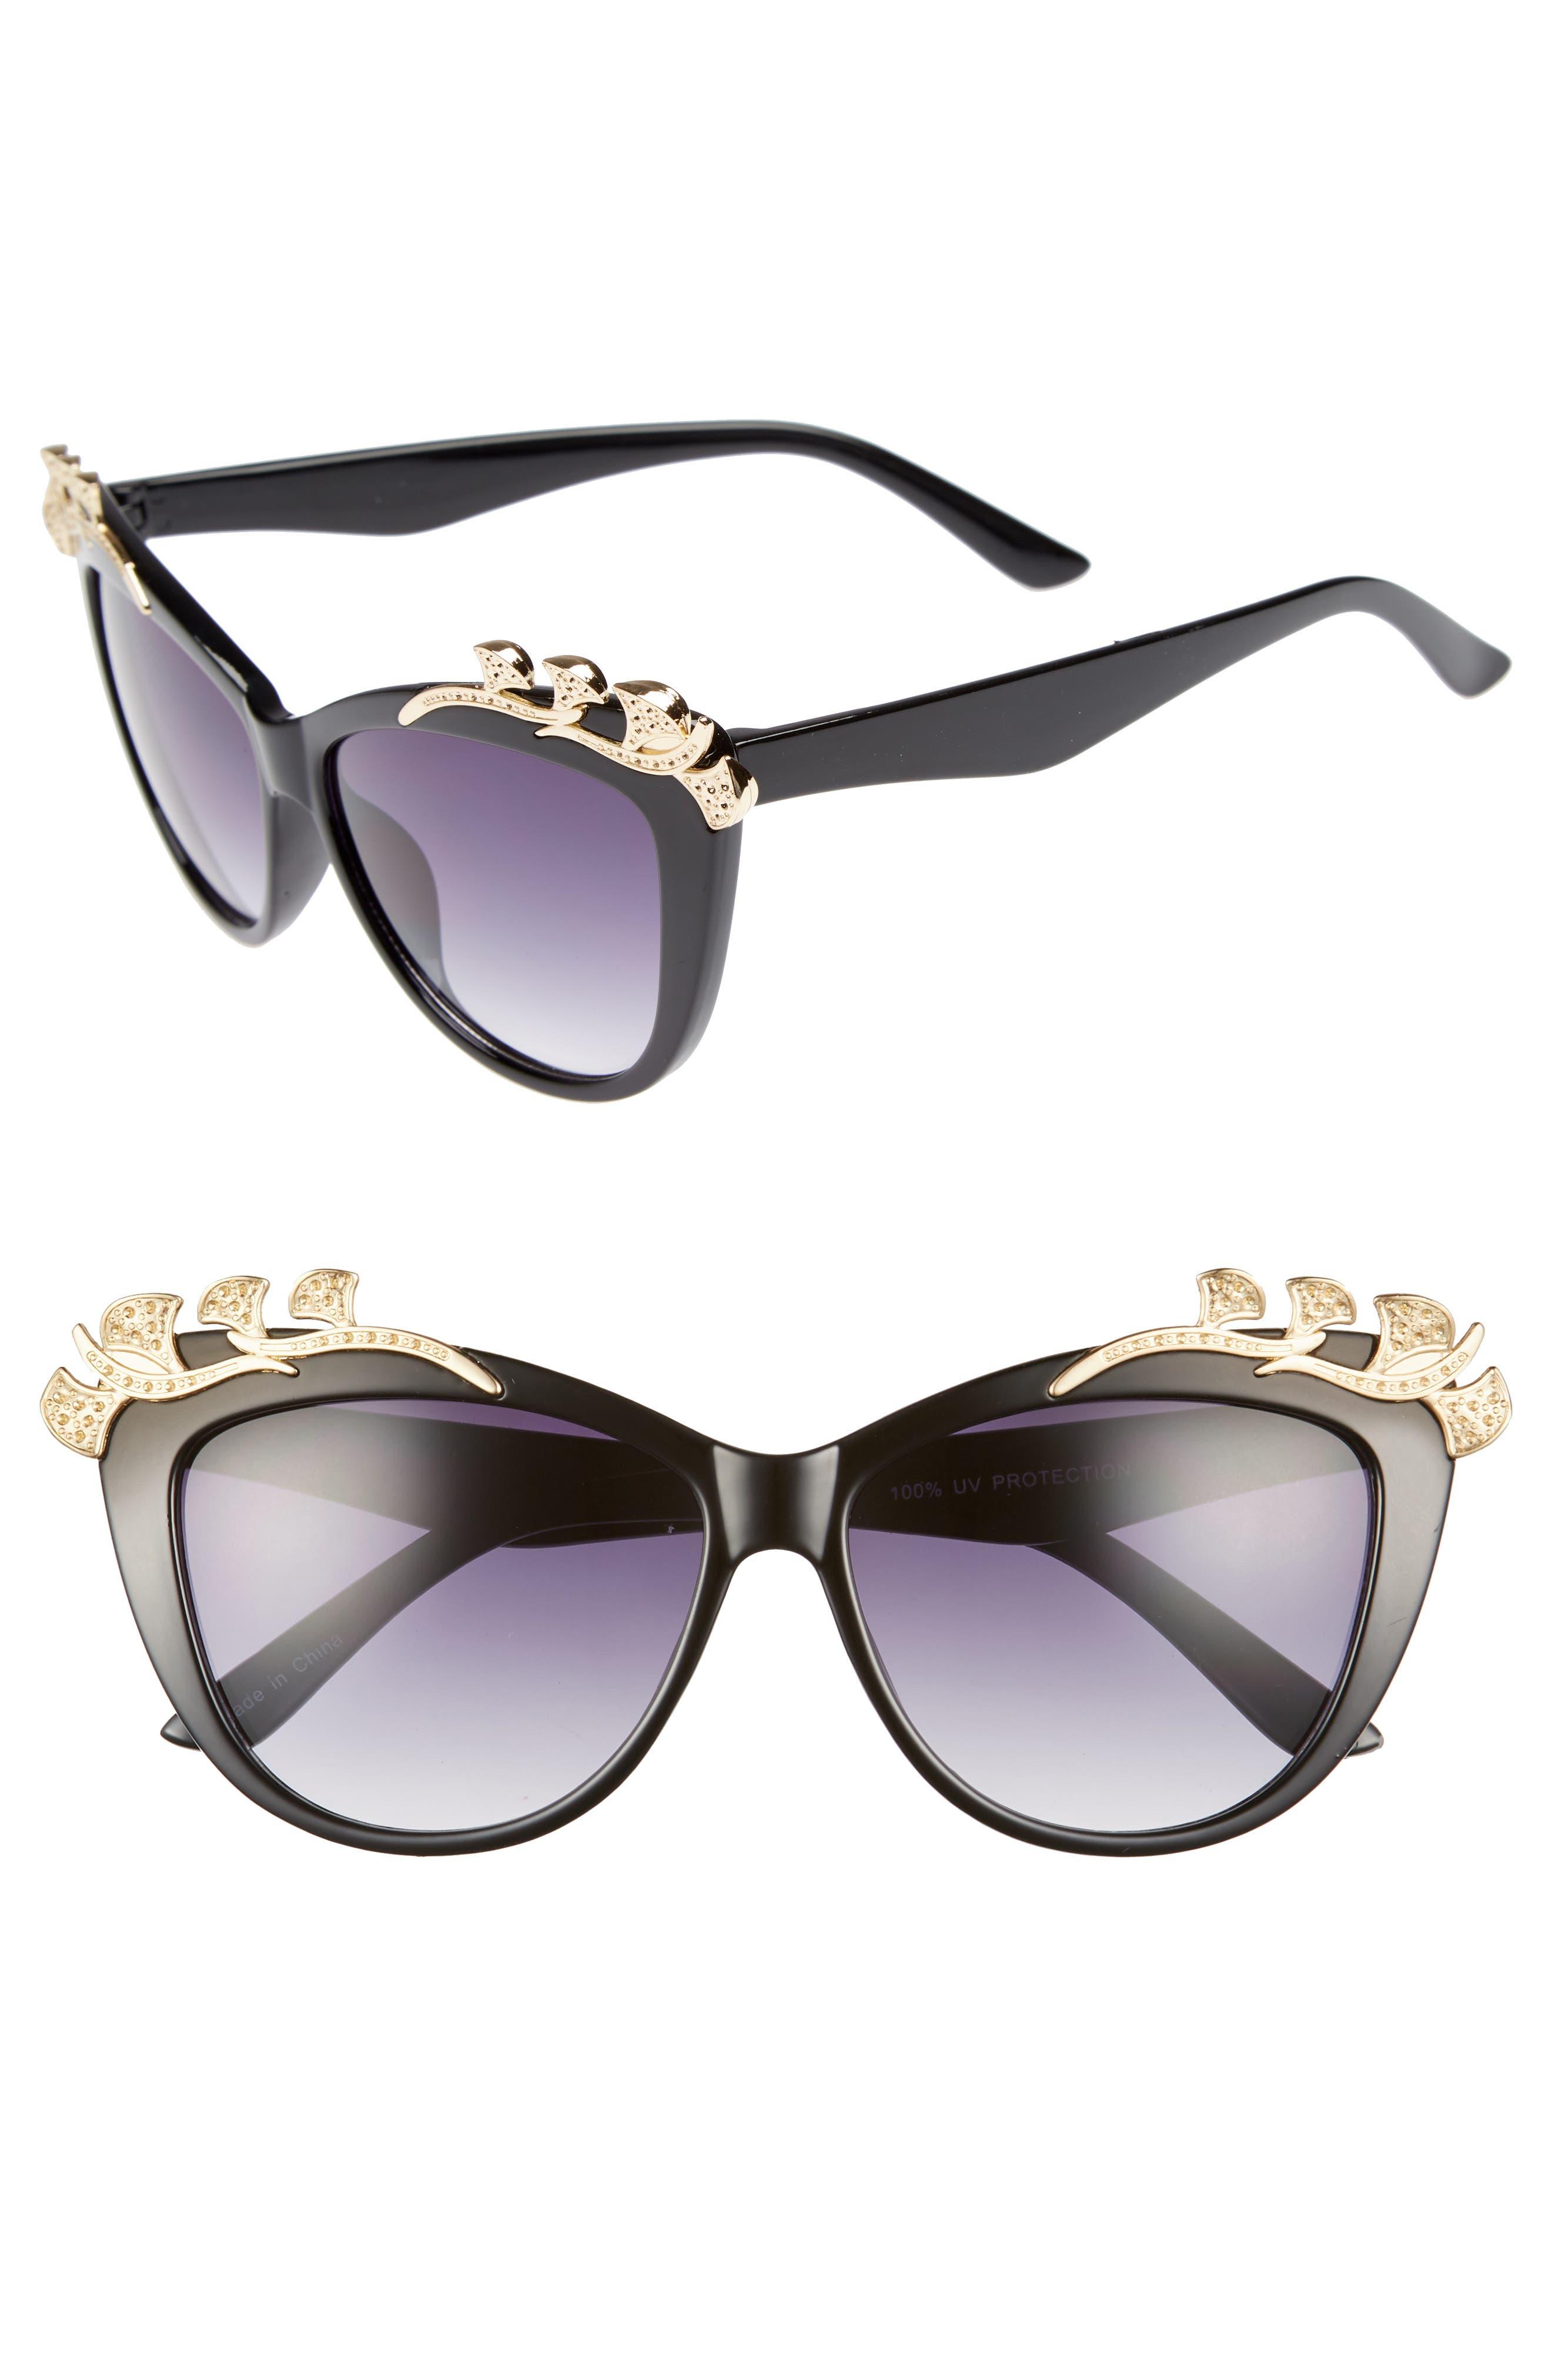 57mm Embellished Sunglasses,                             Main thumbnail 1, color,                             001